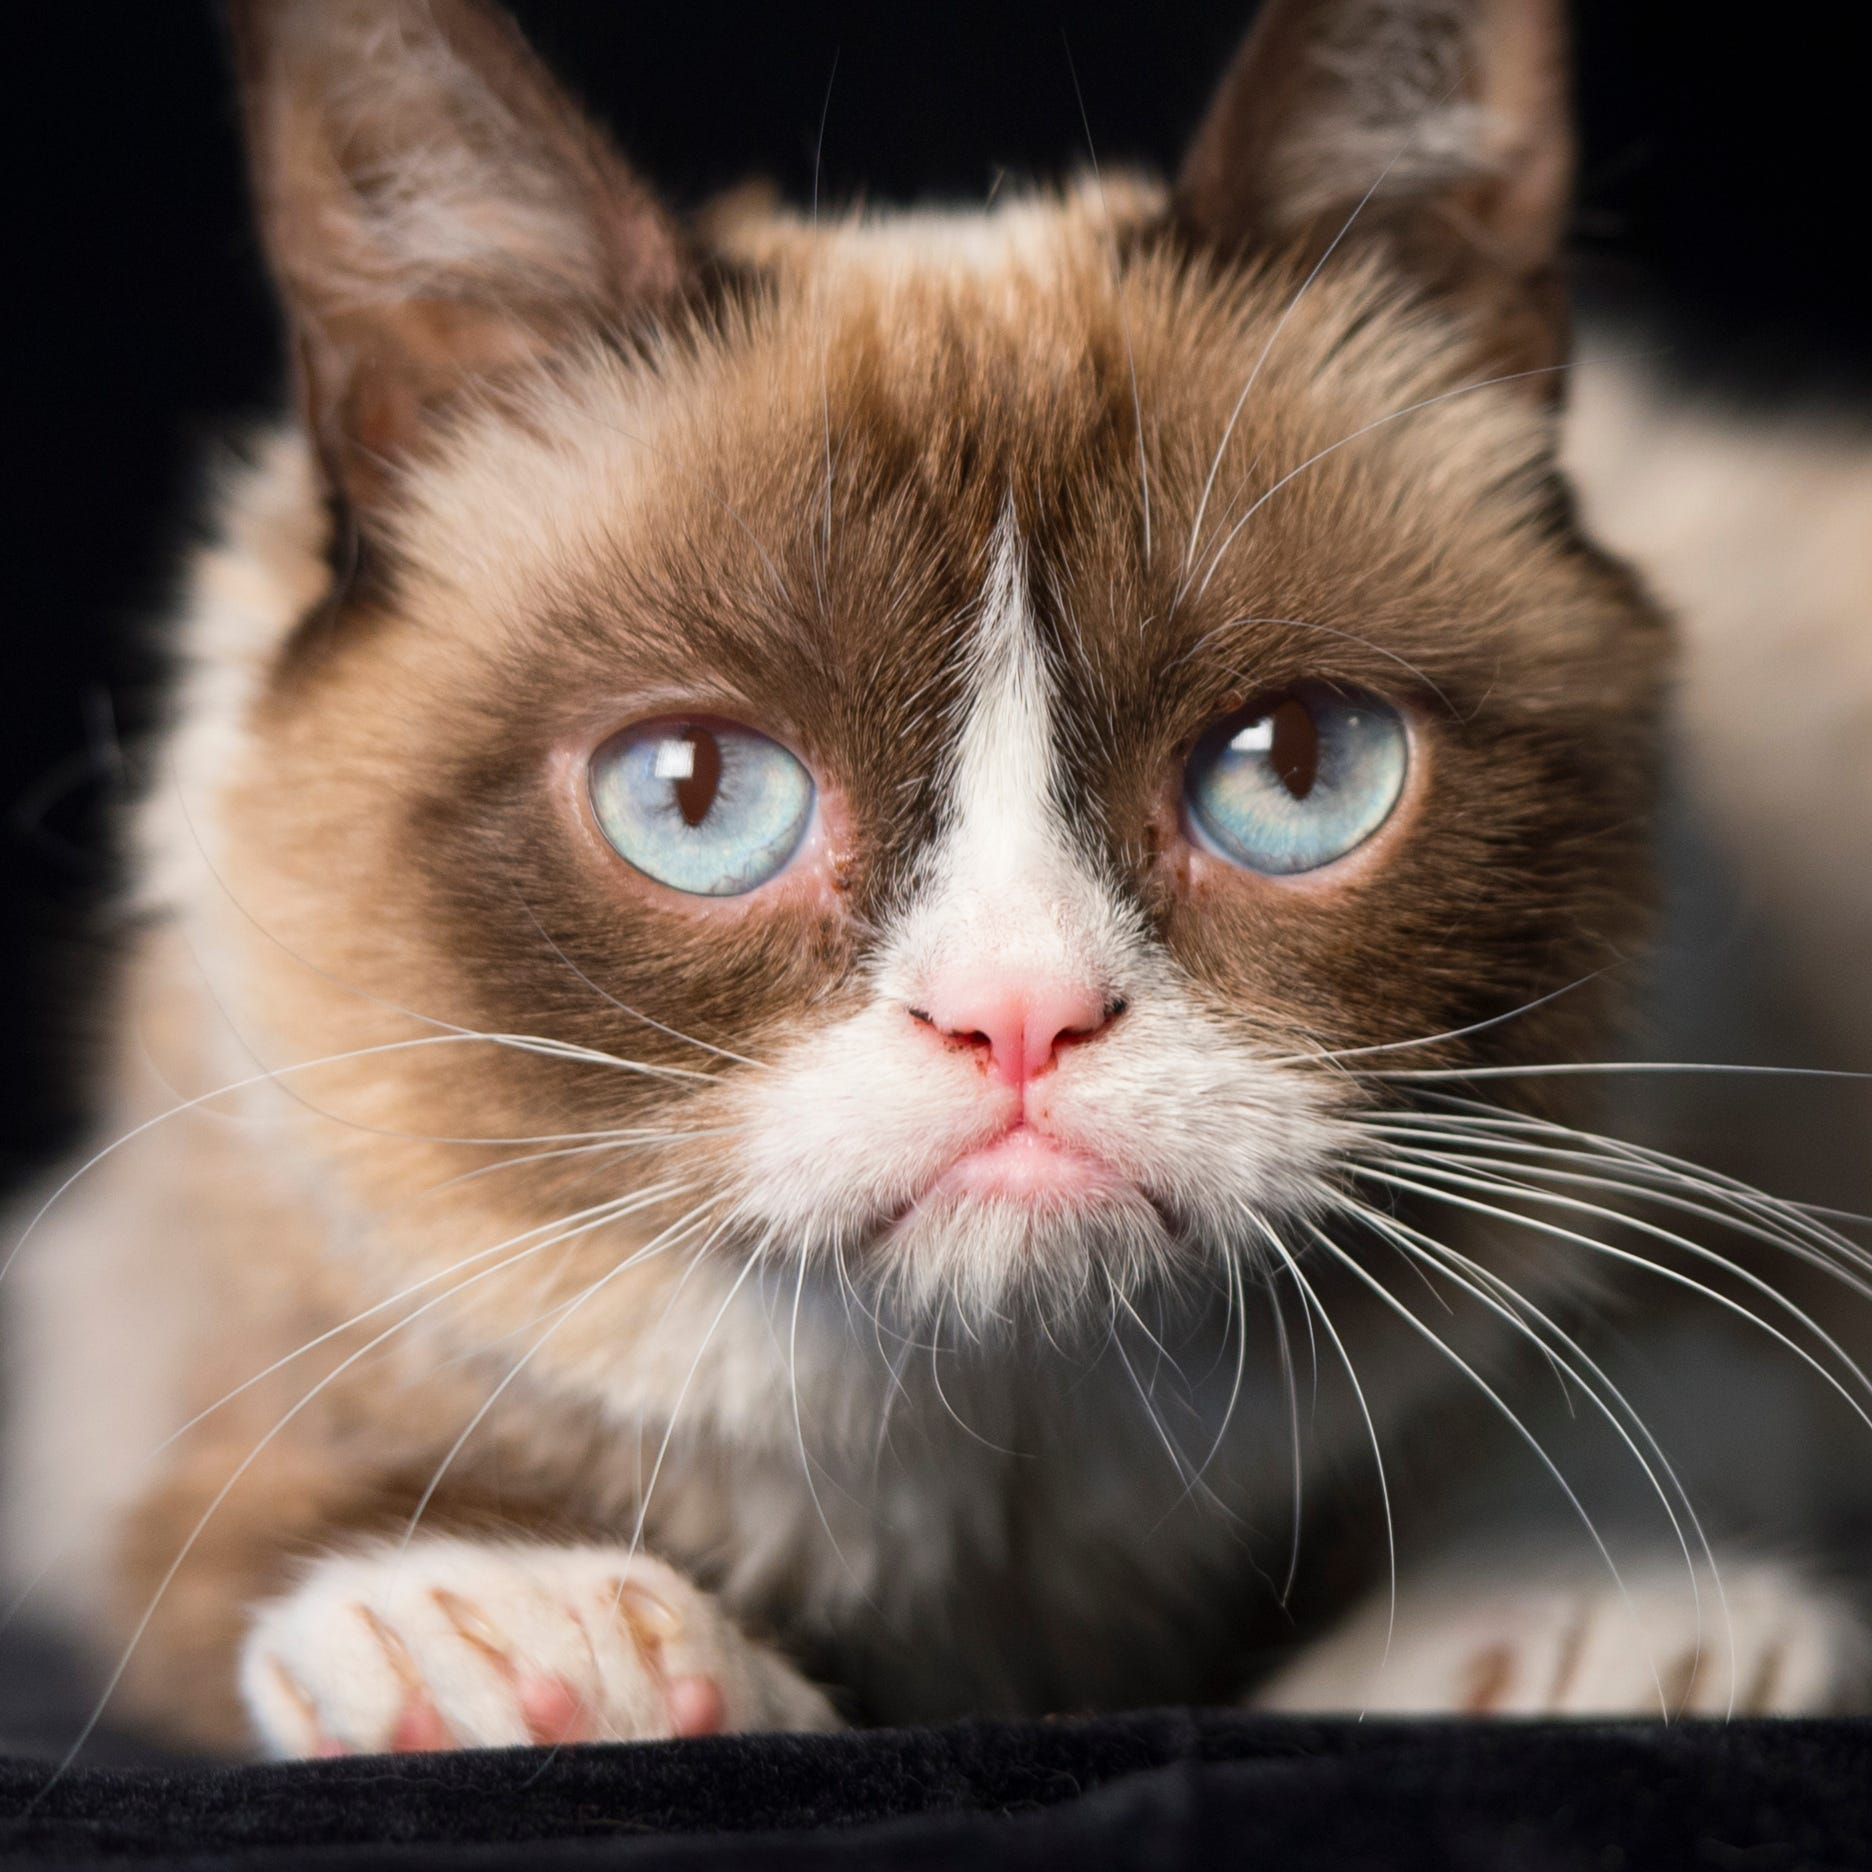 8/7/14 11:31:41 AM -- New York, NY, U.S.A  -- Grumpy Cat - online and publishing feline phenom., --    Photo by Robert Deutsch, USA TODAY Staff ORG XMIT:  RD 131498 GRUMPY CAT 8/7/2014 [Via MerlinFTP Drop]